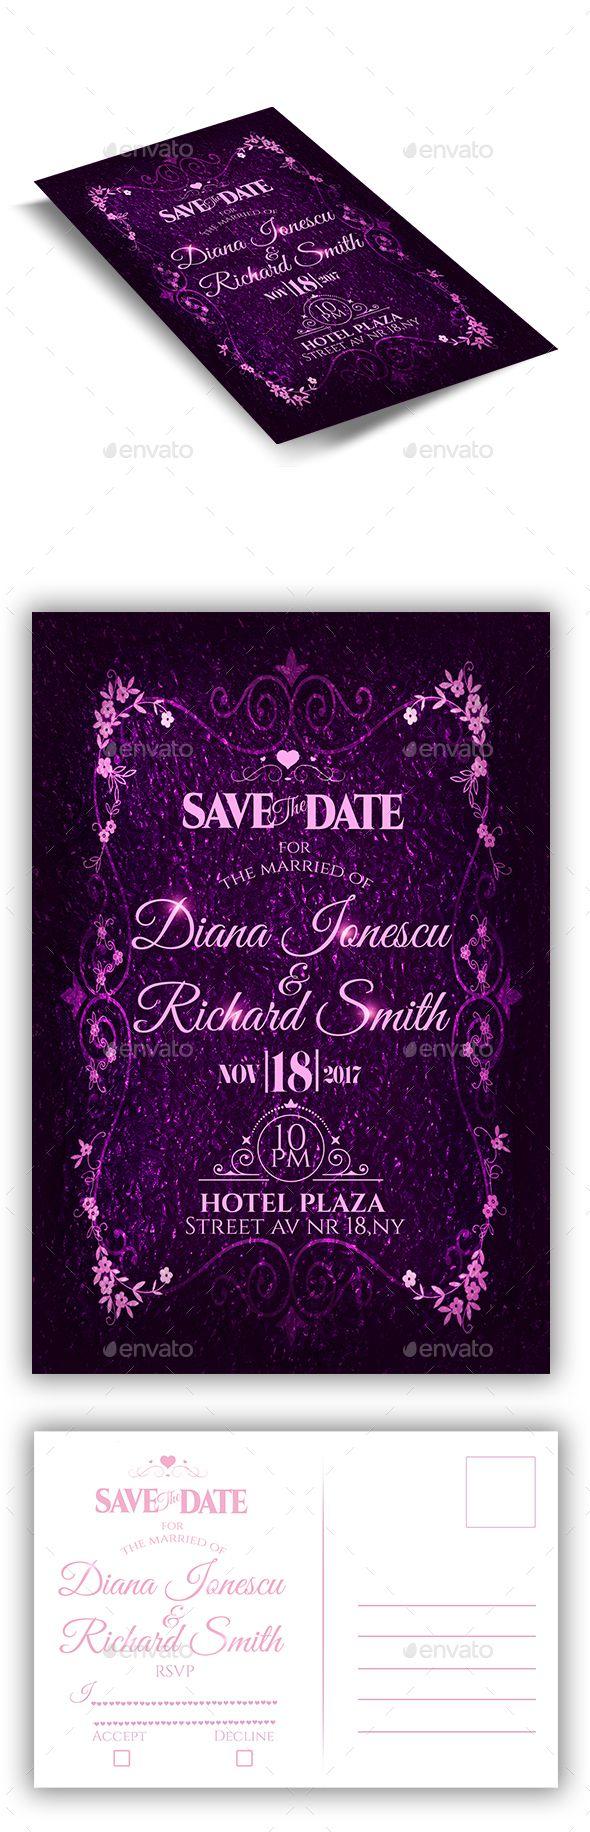 wedding invitation design psd%0A Wedding Invitation Flyer   RSVP